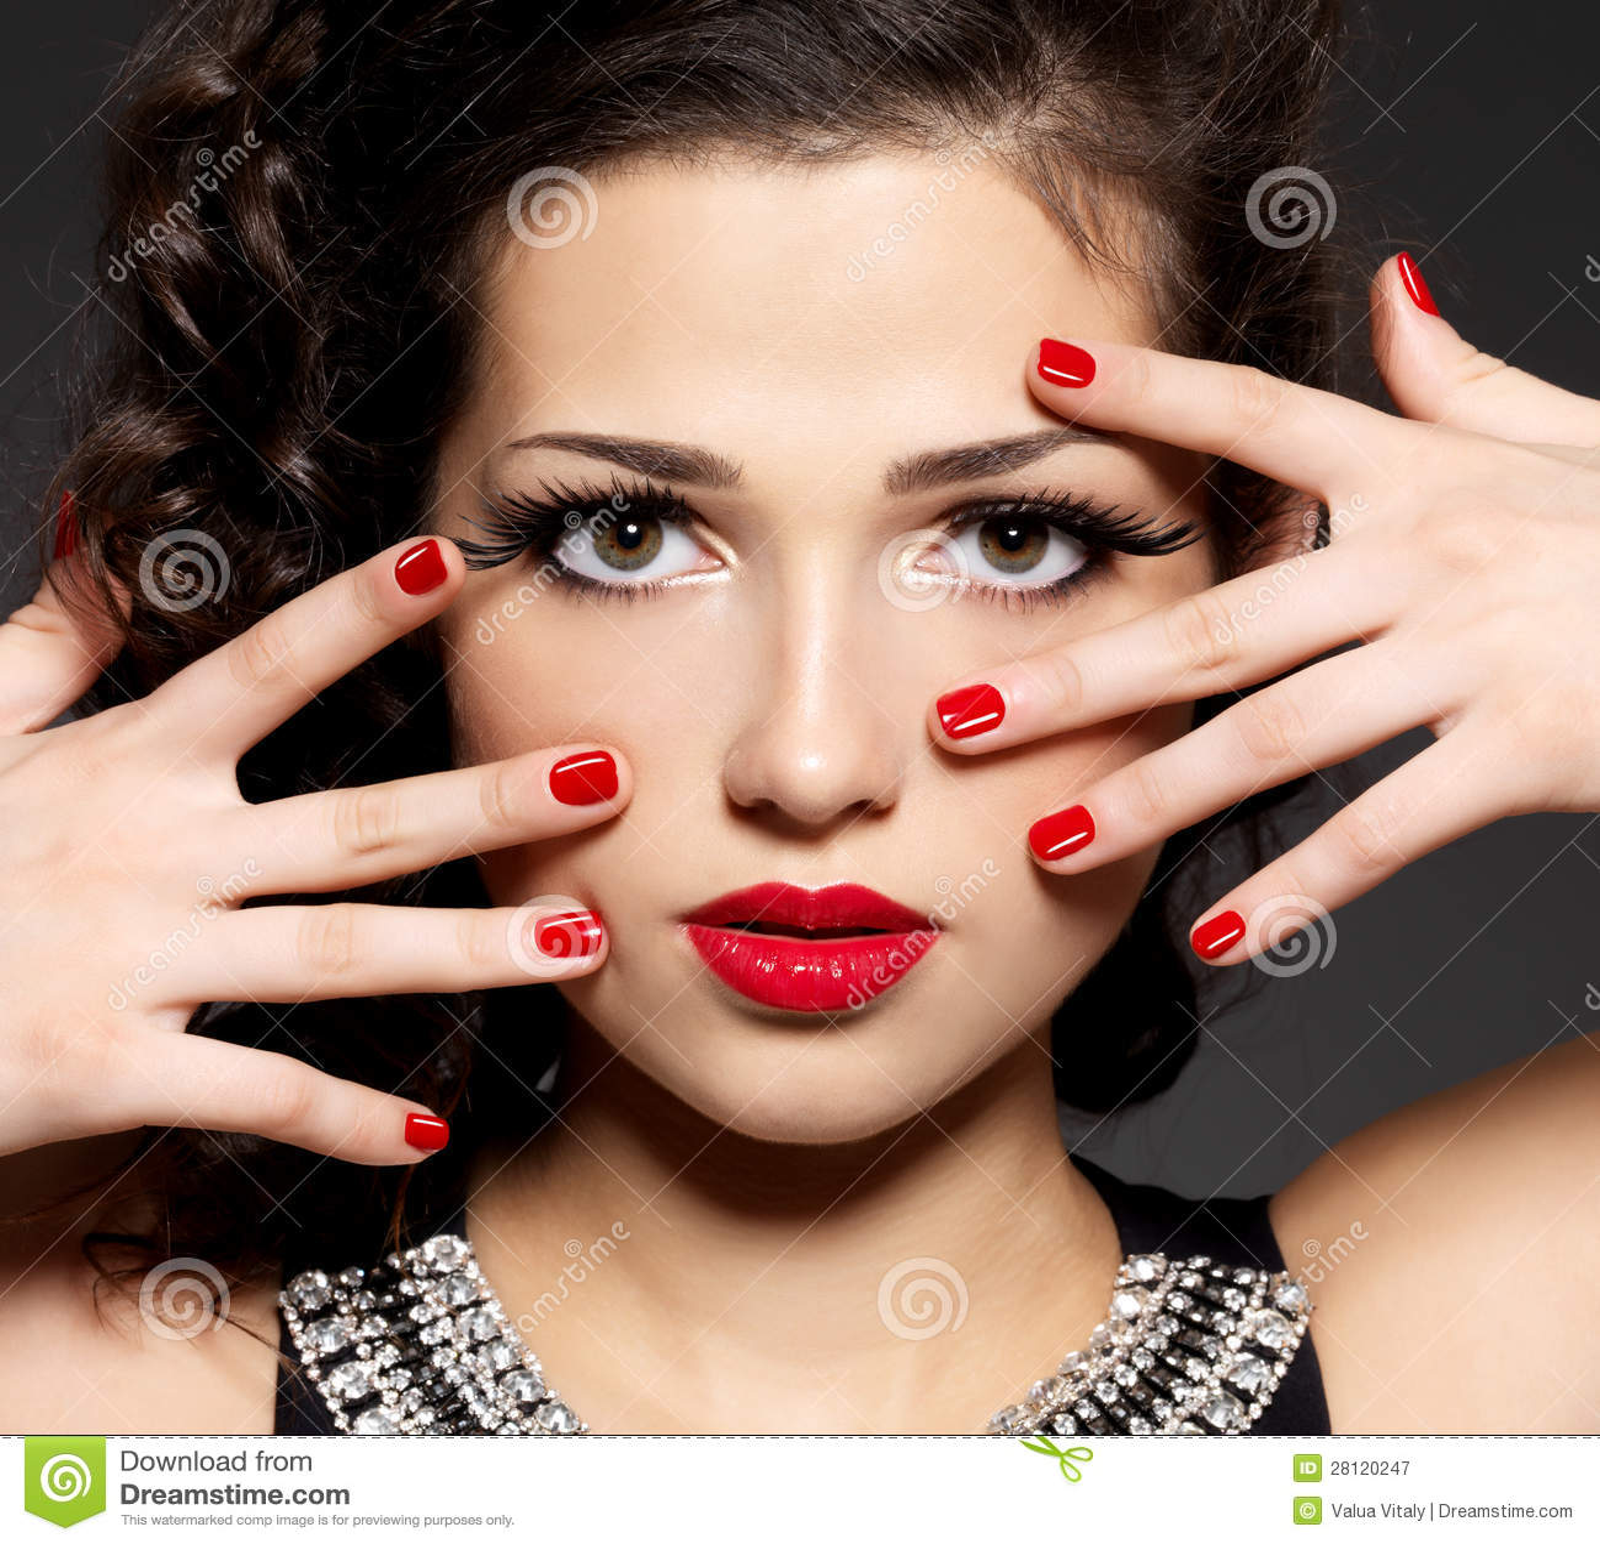 Superhero Makeup Brunette Woman With Re...